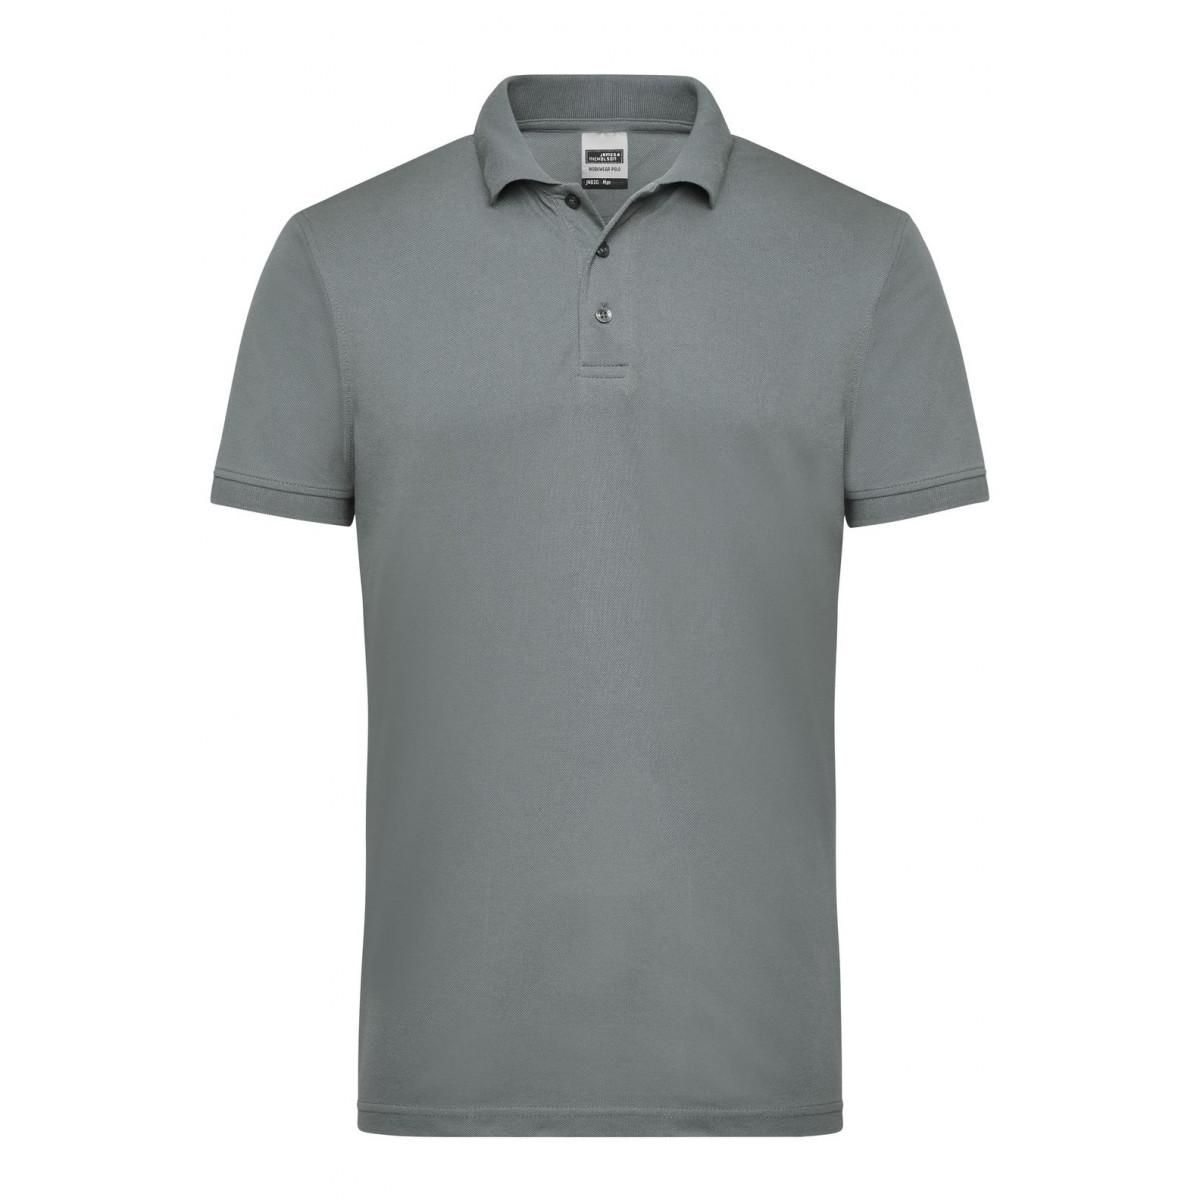 Рубашка поло мужская JN830 Mens Workwear Polo - Темно-серый